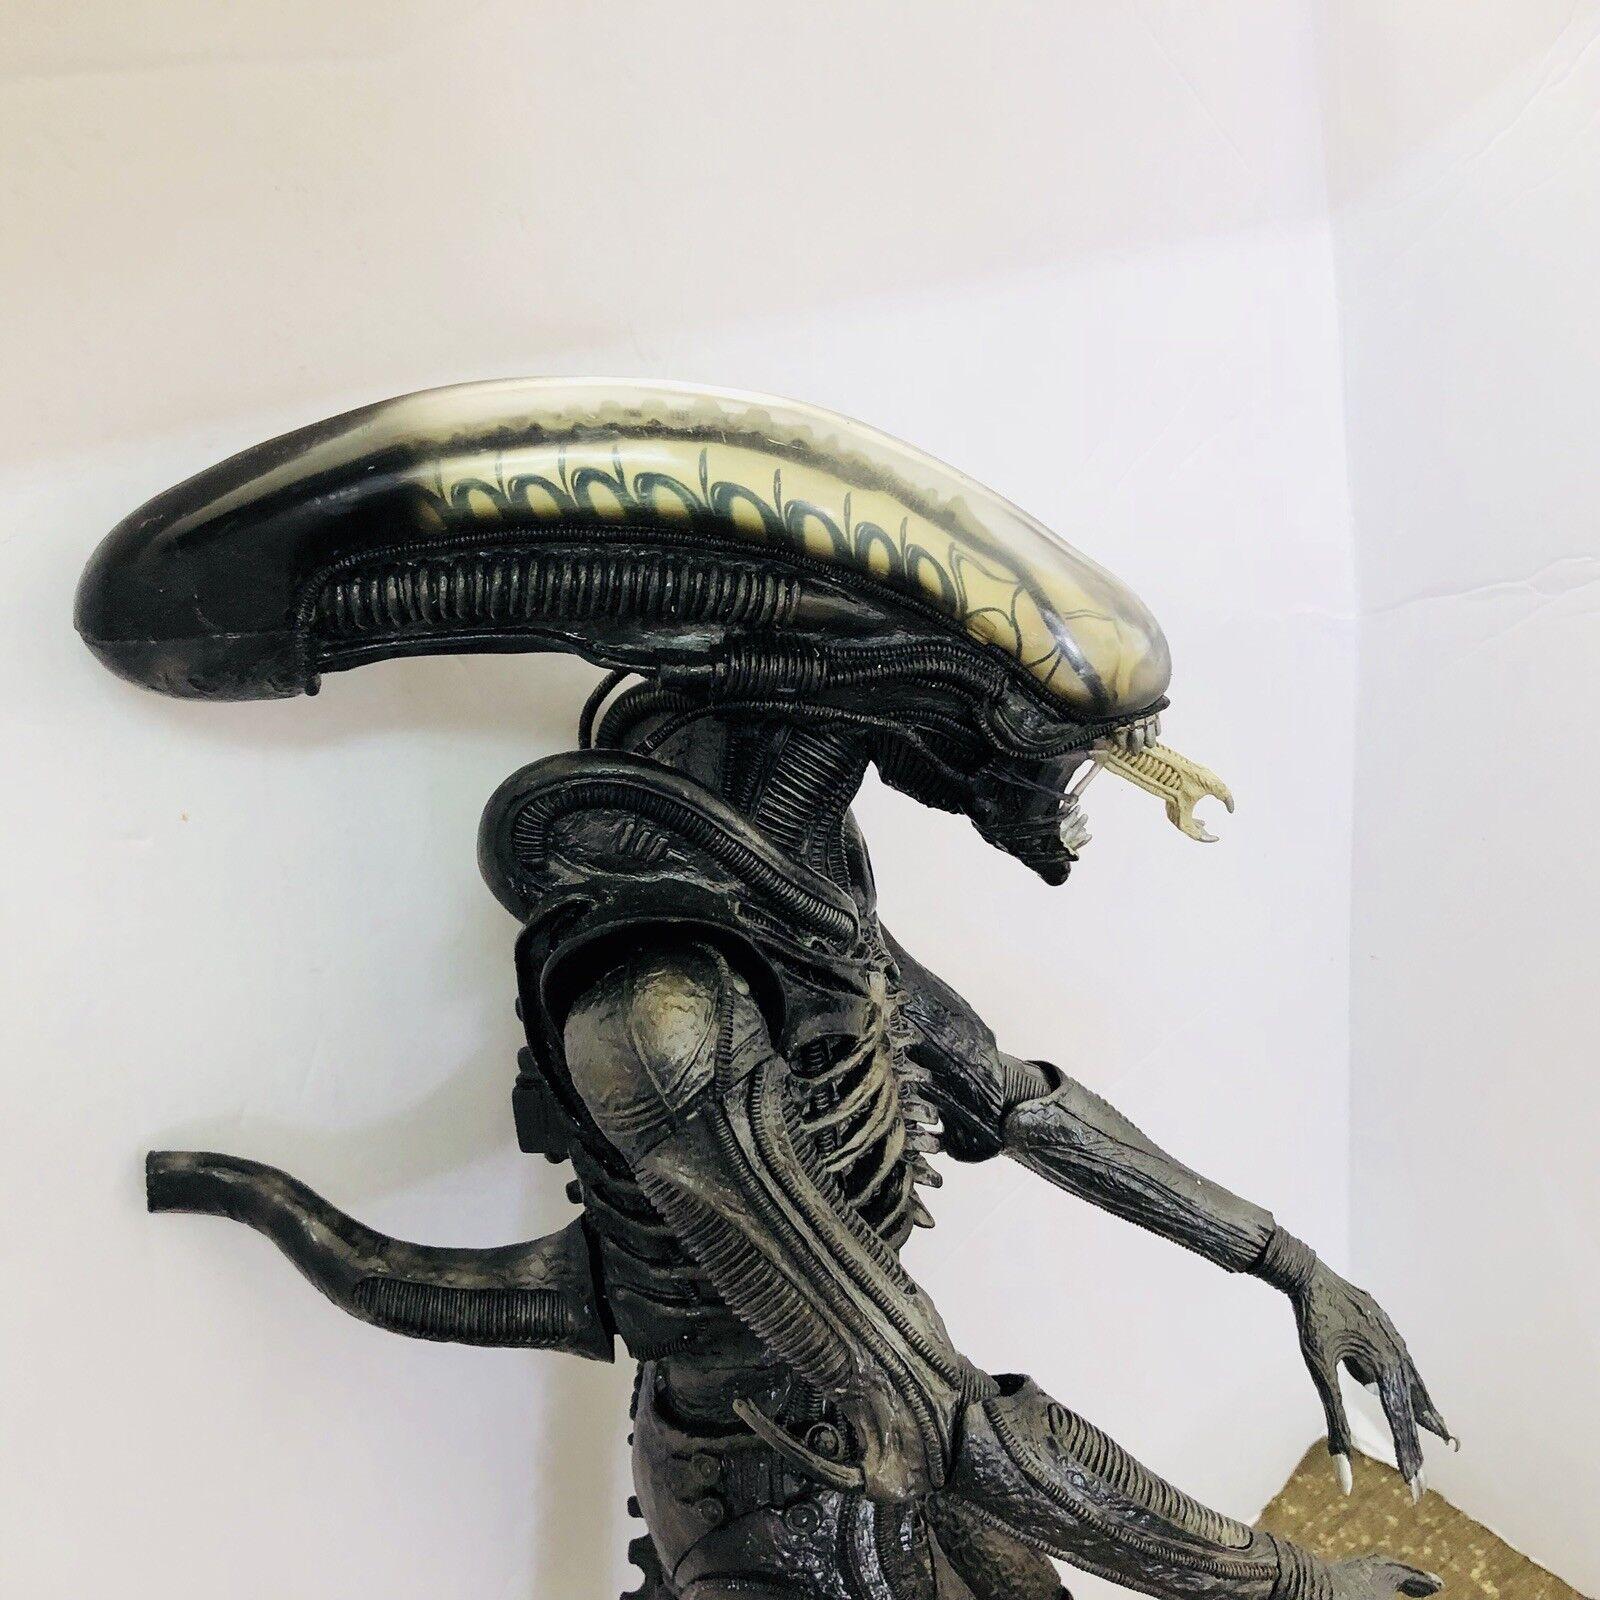 2008 NECA Alien Big Chap Xenomorph 22